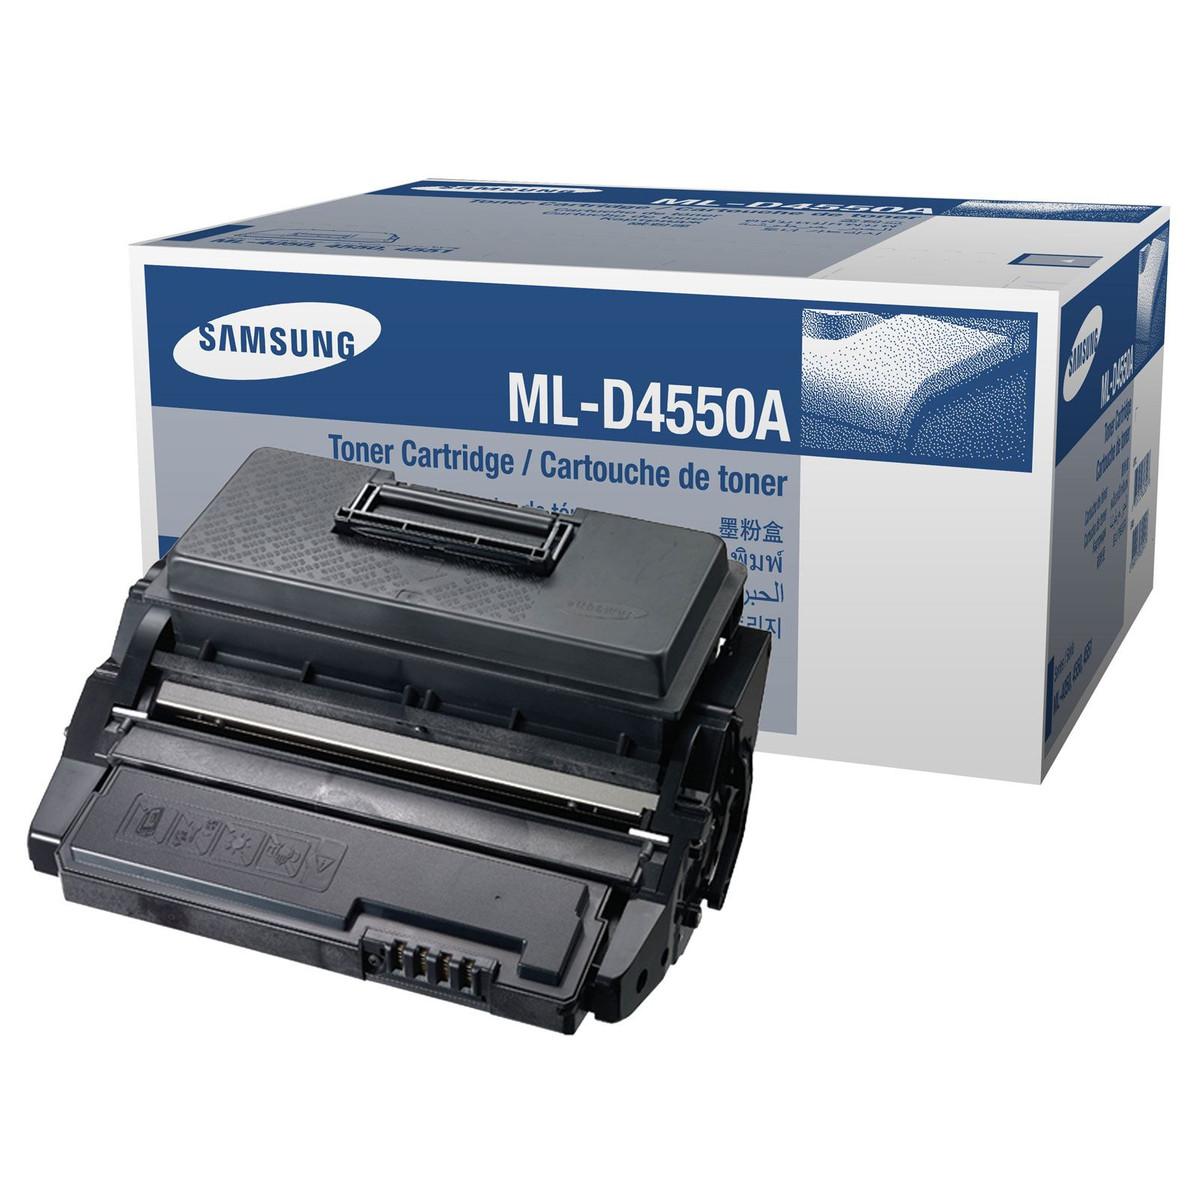 Samsung ML-D4550A Black Toner Cartridge